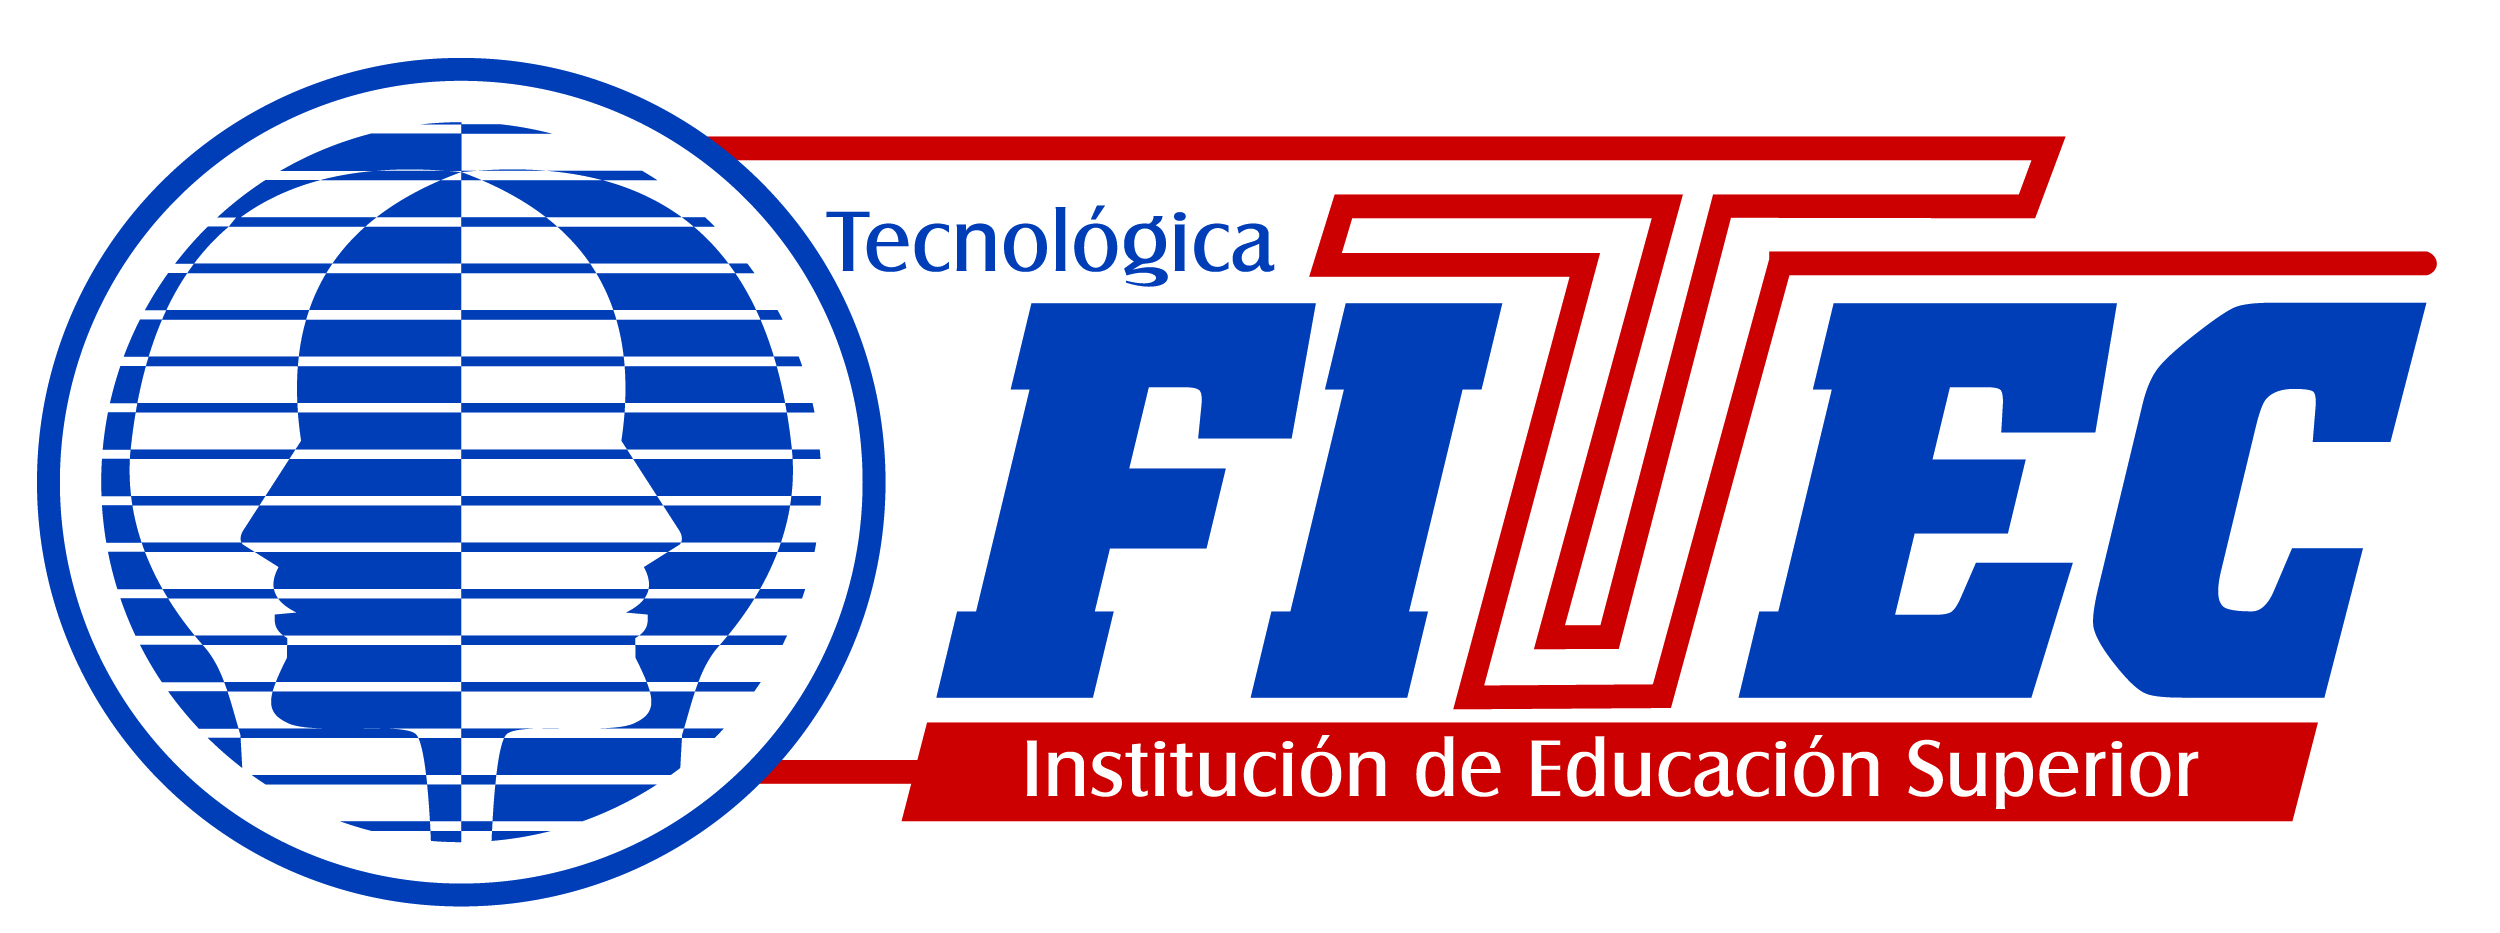 TECNOLOGICA FITEC